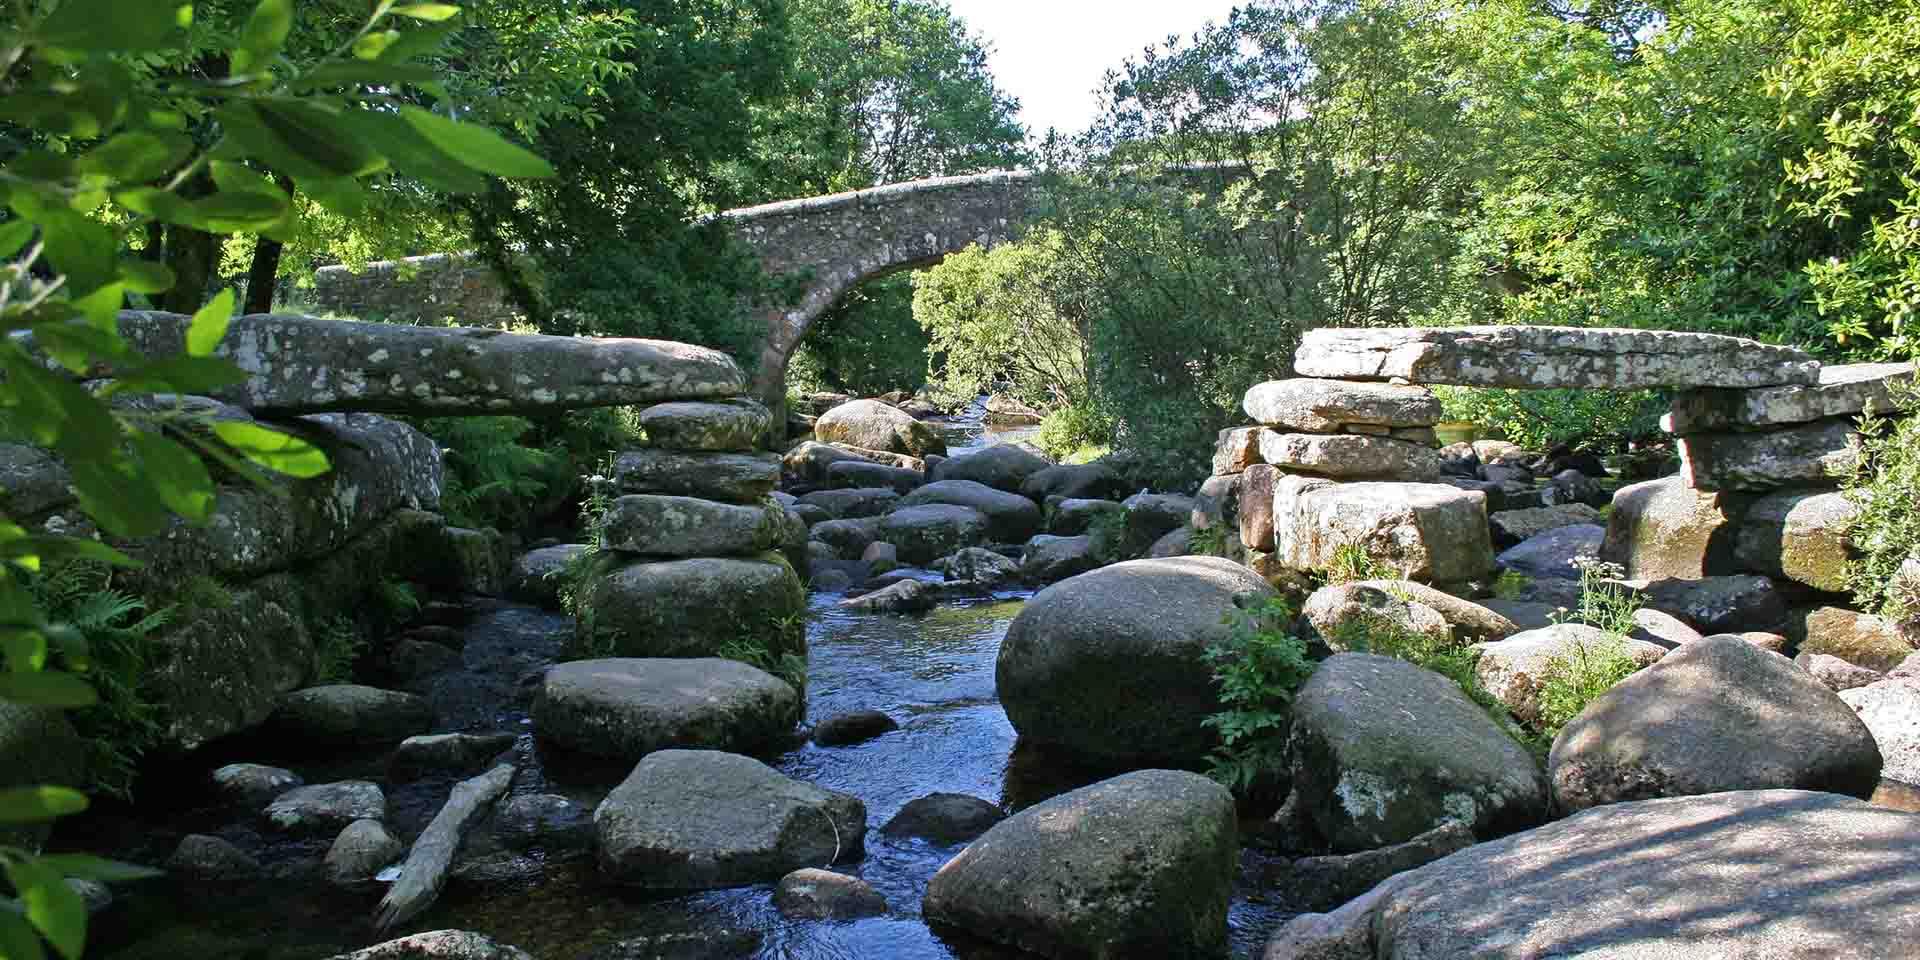 Dartmeet clapper bridge with modern bridge behind